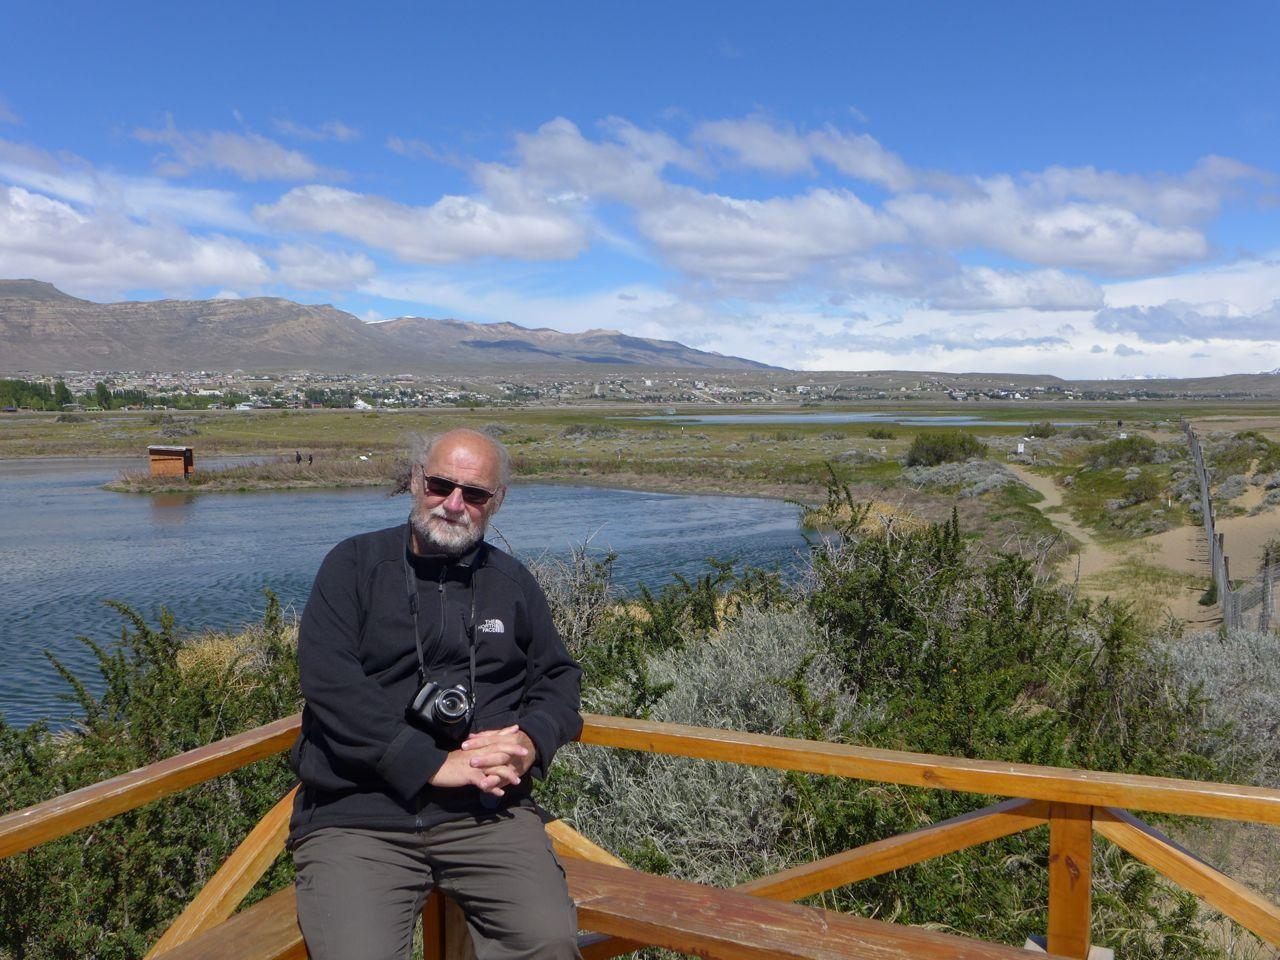 El calafate, la Patagonie.